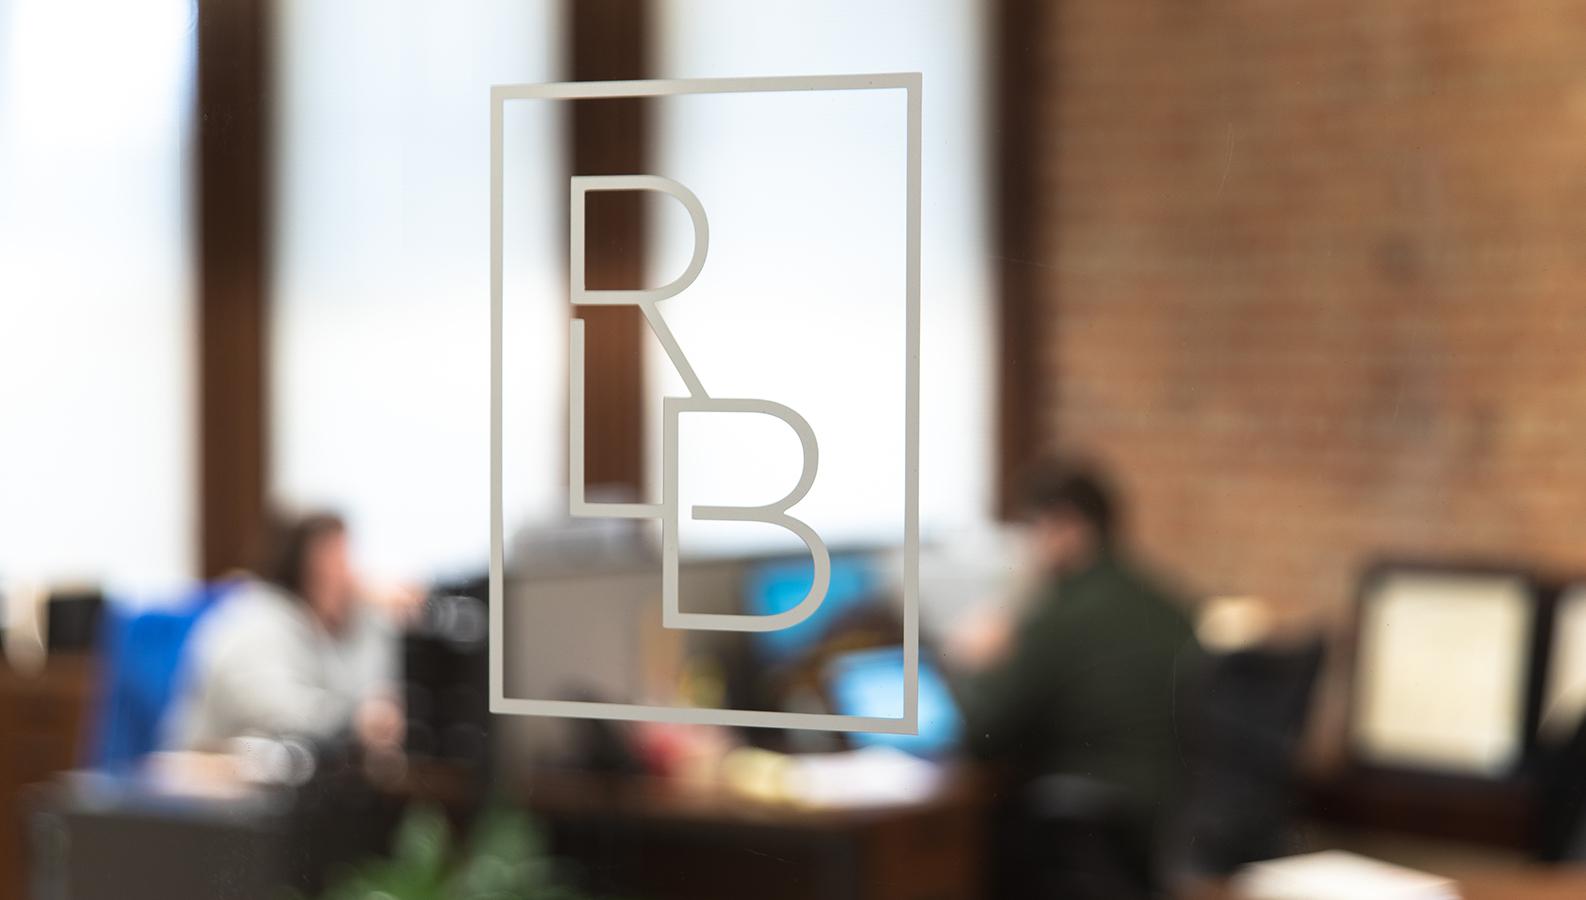 Roach Lennon & Brown, Logo, Law Firm, Businesses, Legal Services